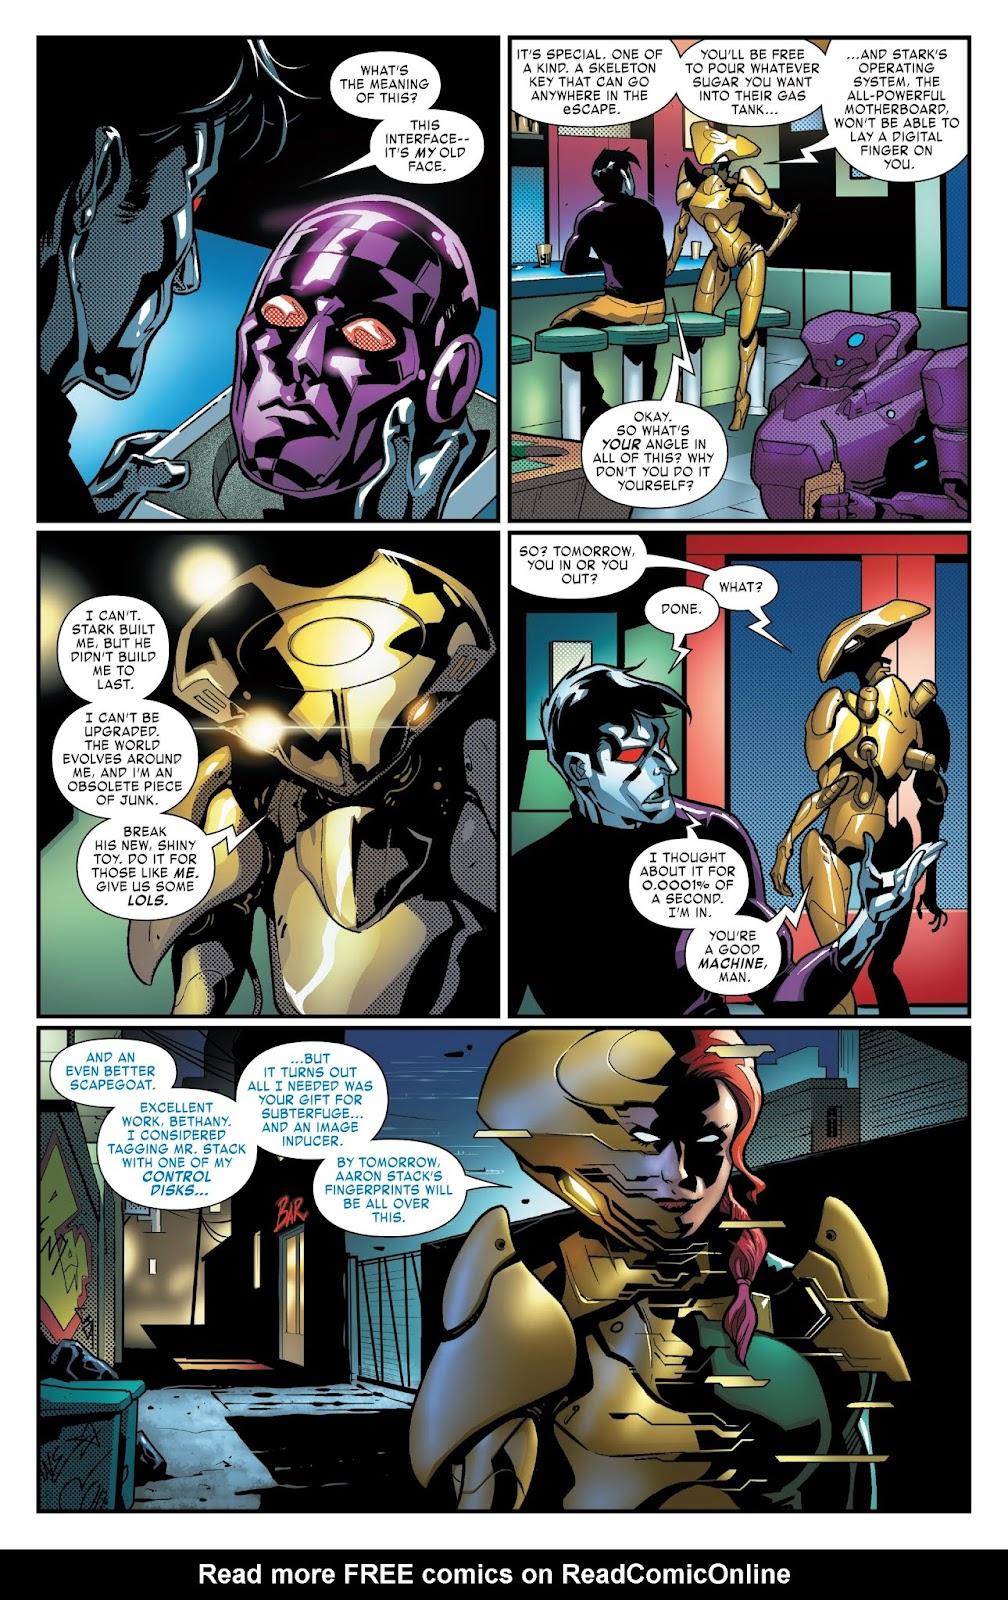 Read online Tony Stark: Iron Man comic -  Issue #3 - 14